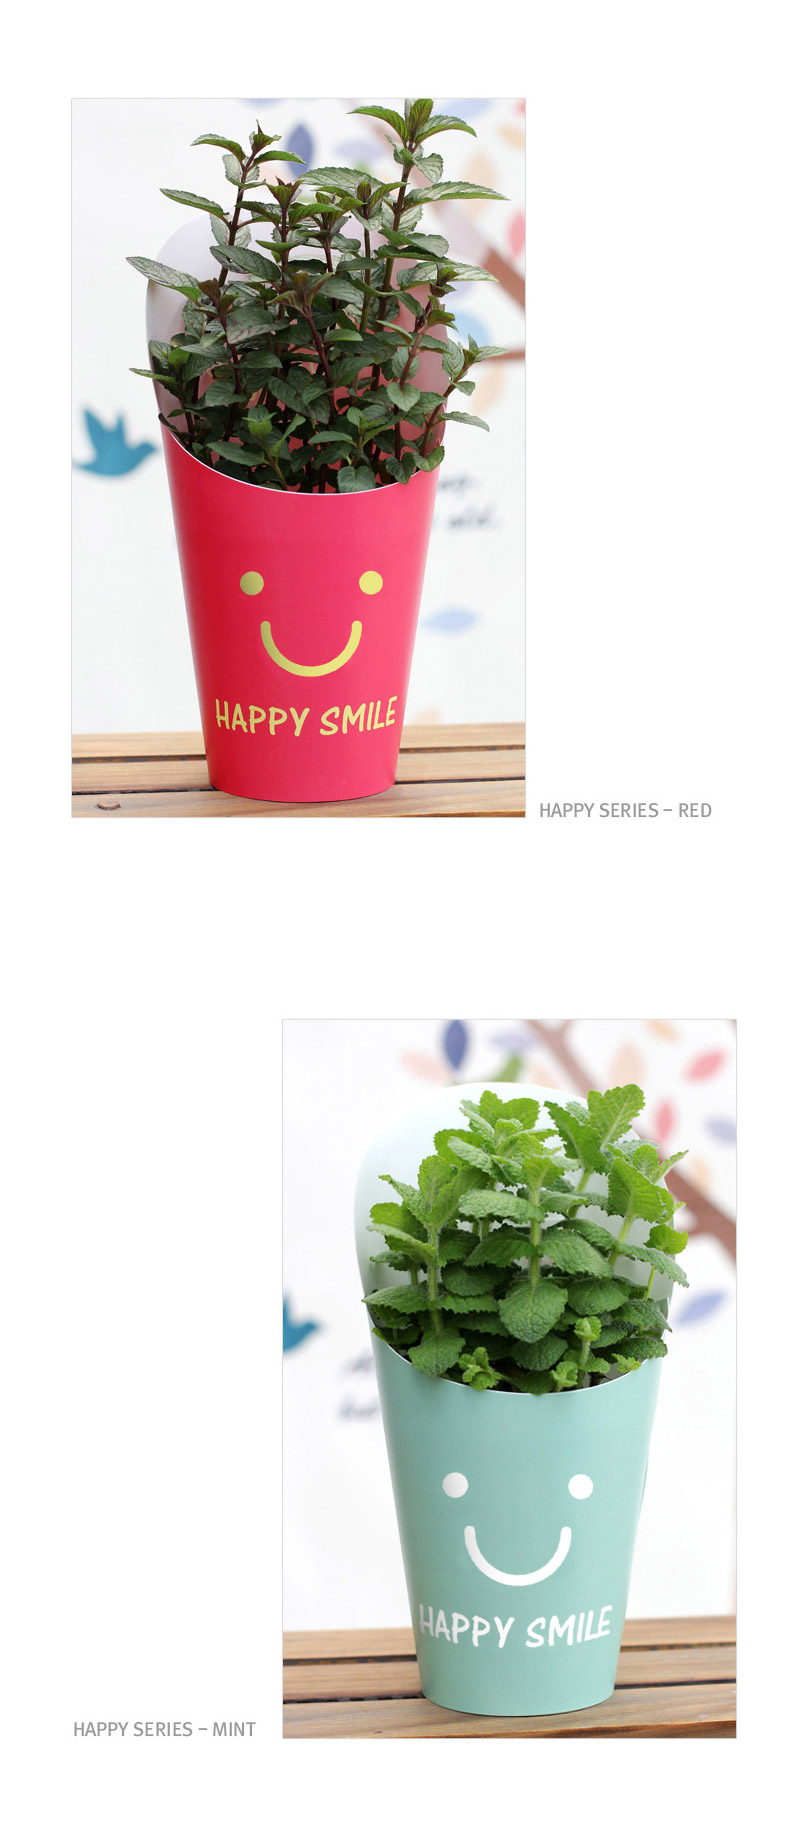 happy_smile_02.jpg